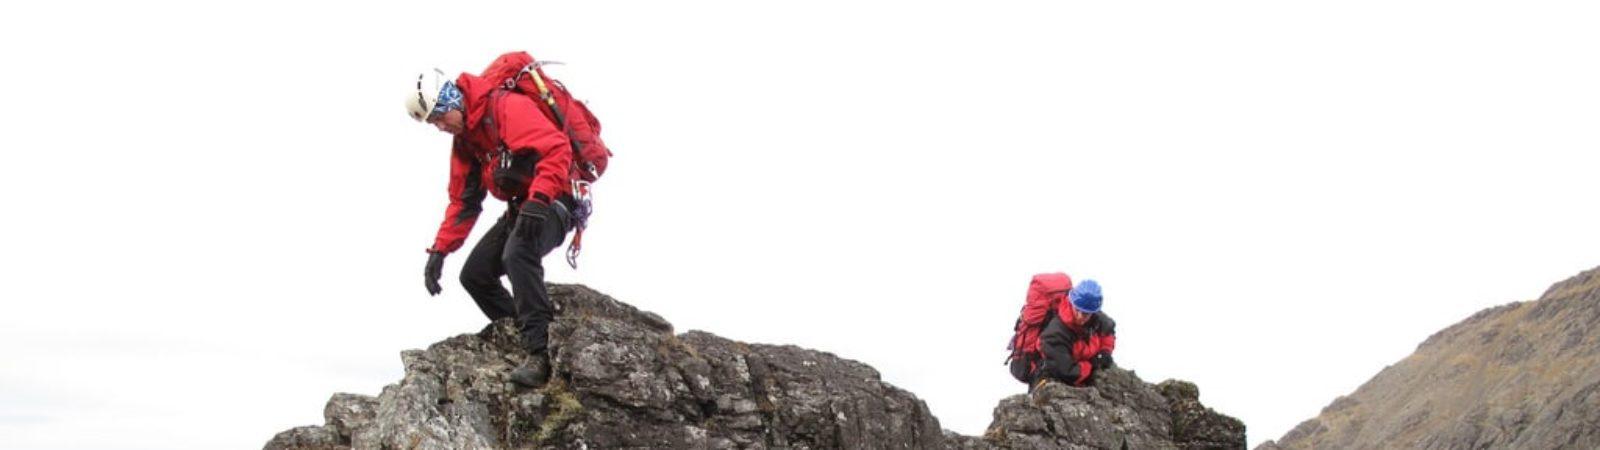 4-day climbing traverse on the Cuillin ridge